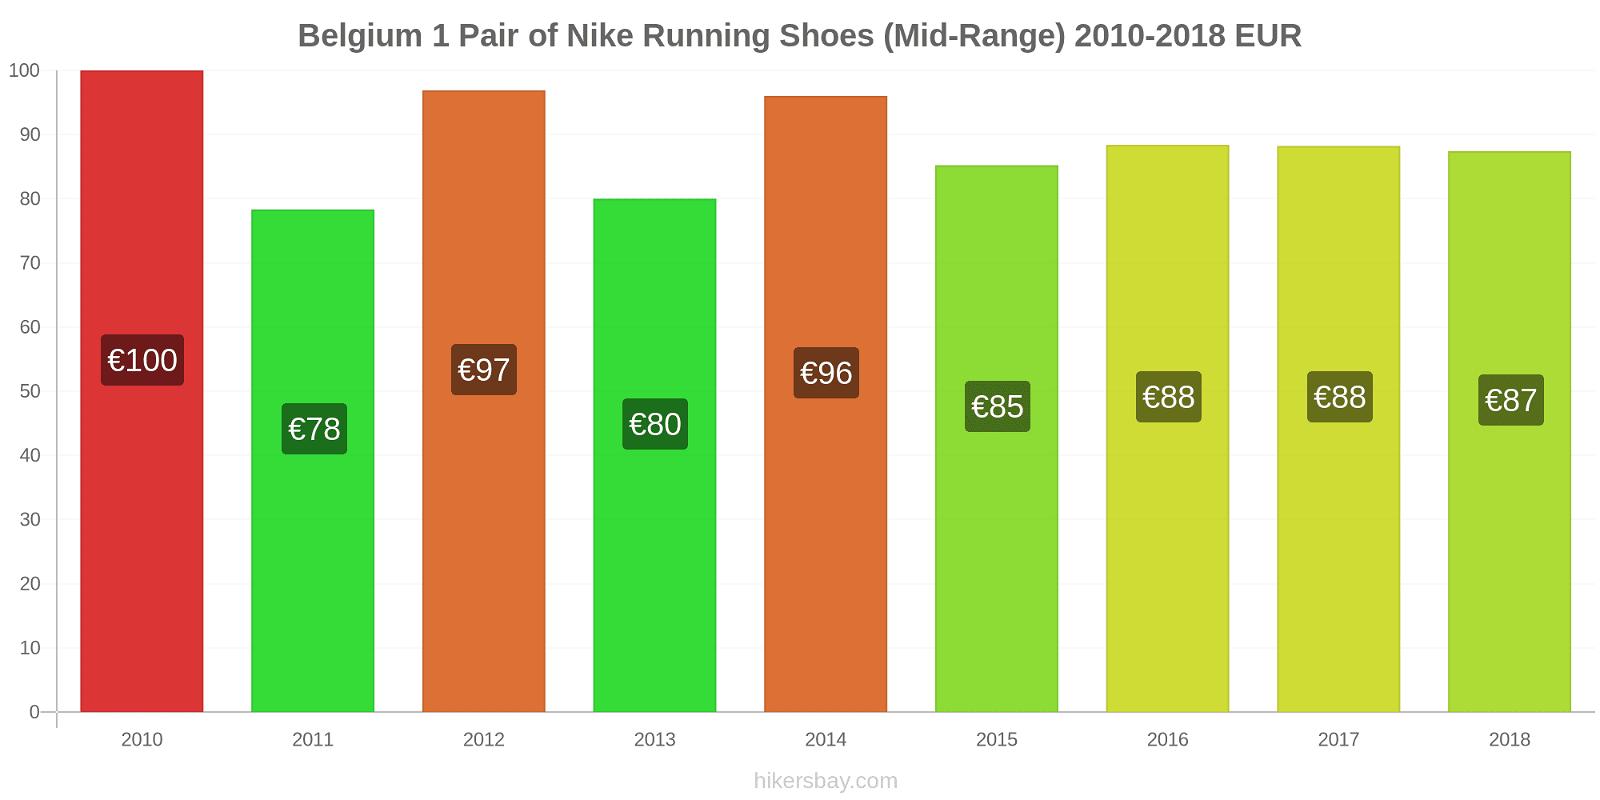 Belgium price changes 1 Pair of Nike Running Shoes (Mid-Range) hikersbay.com